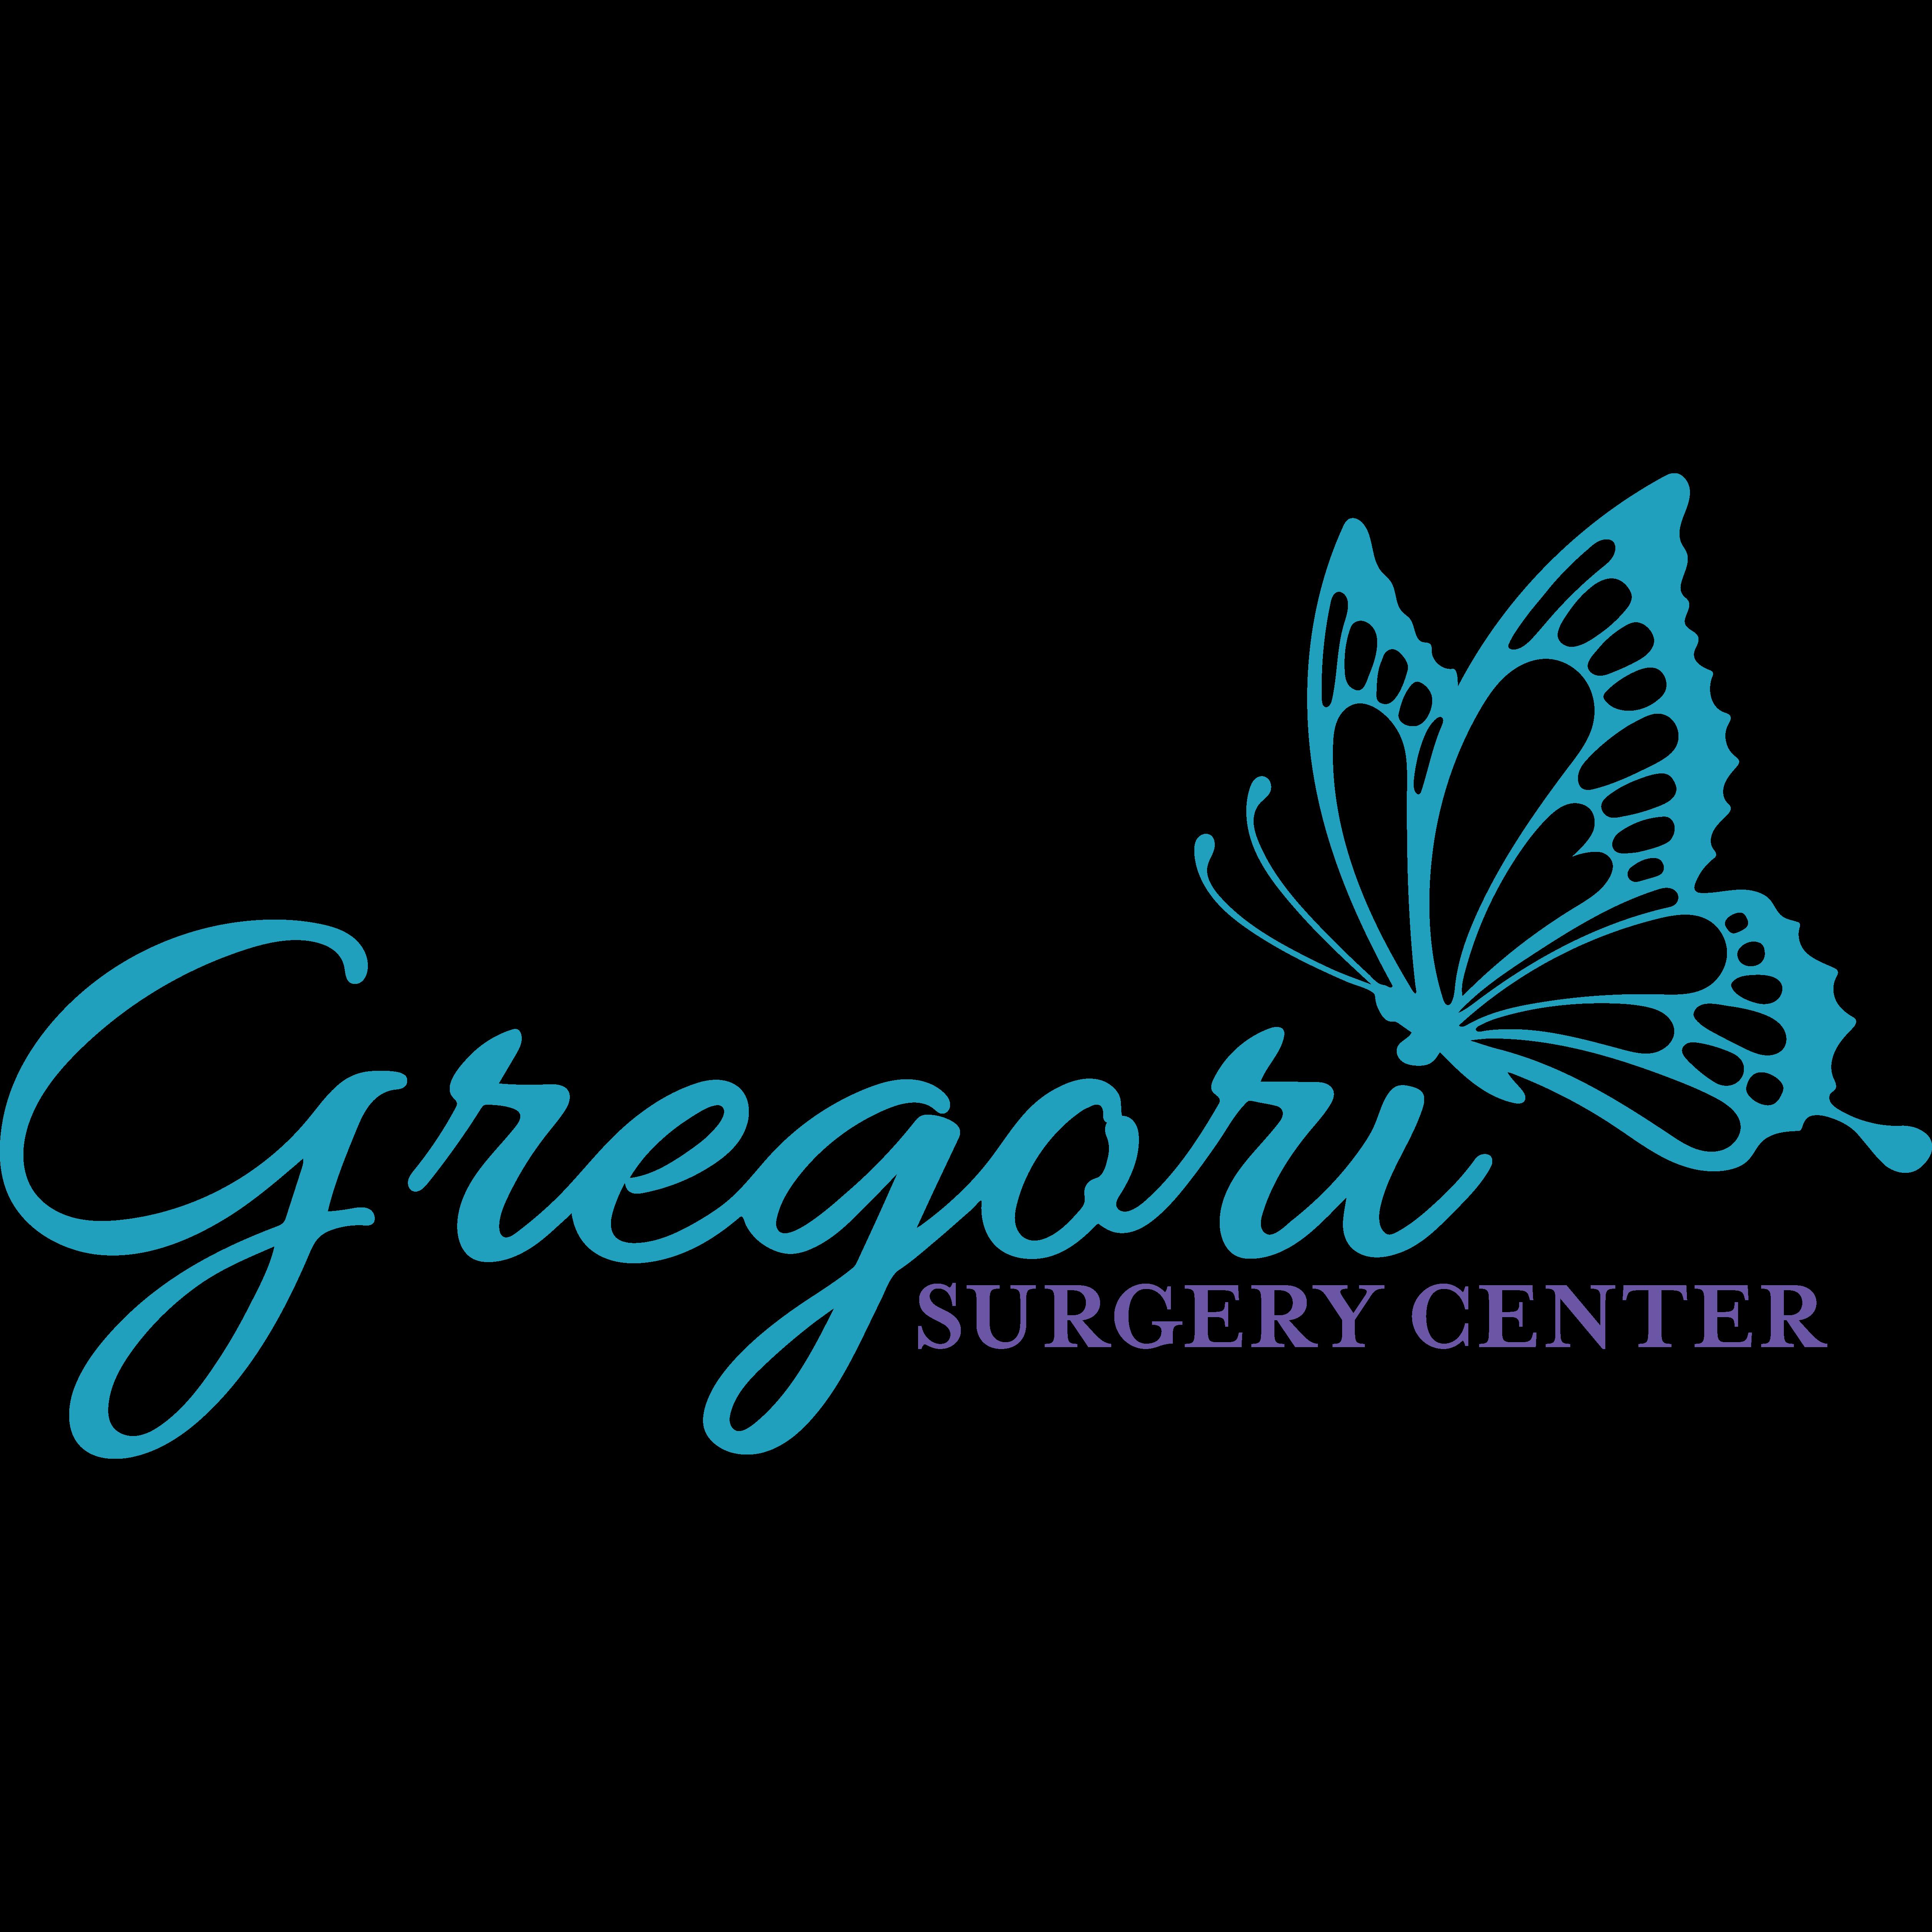 The Gregori Surgery Center